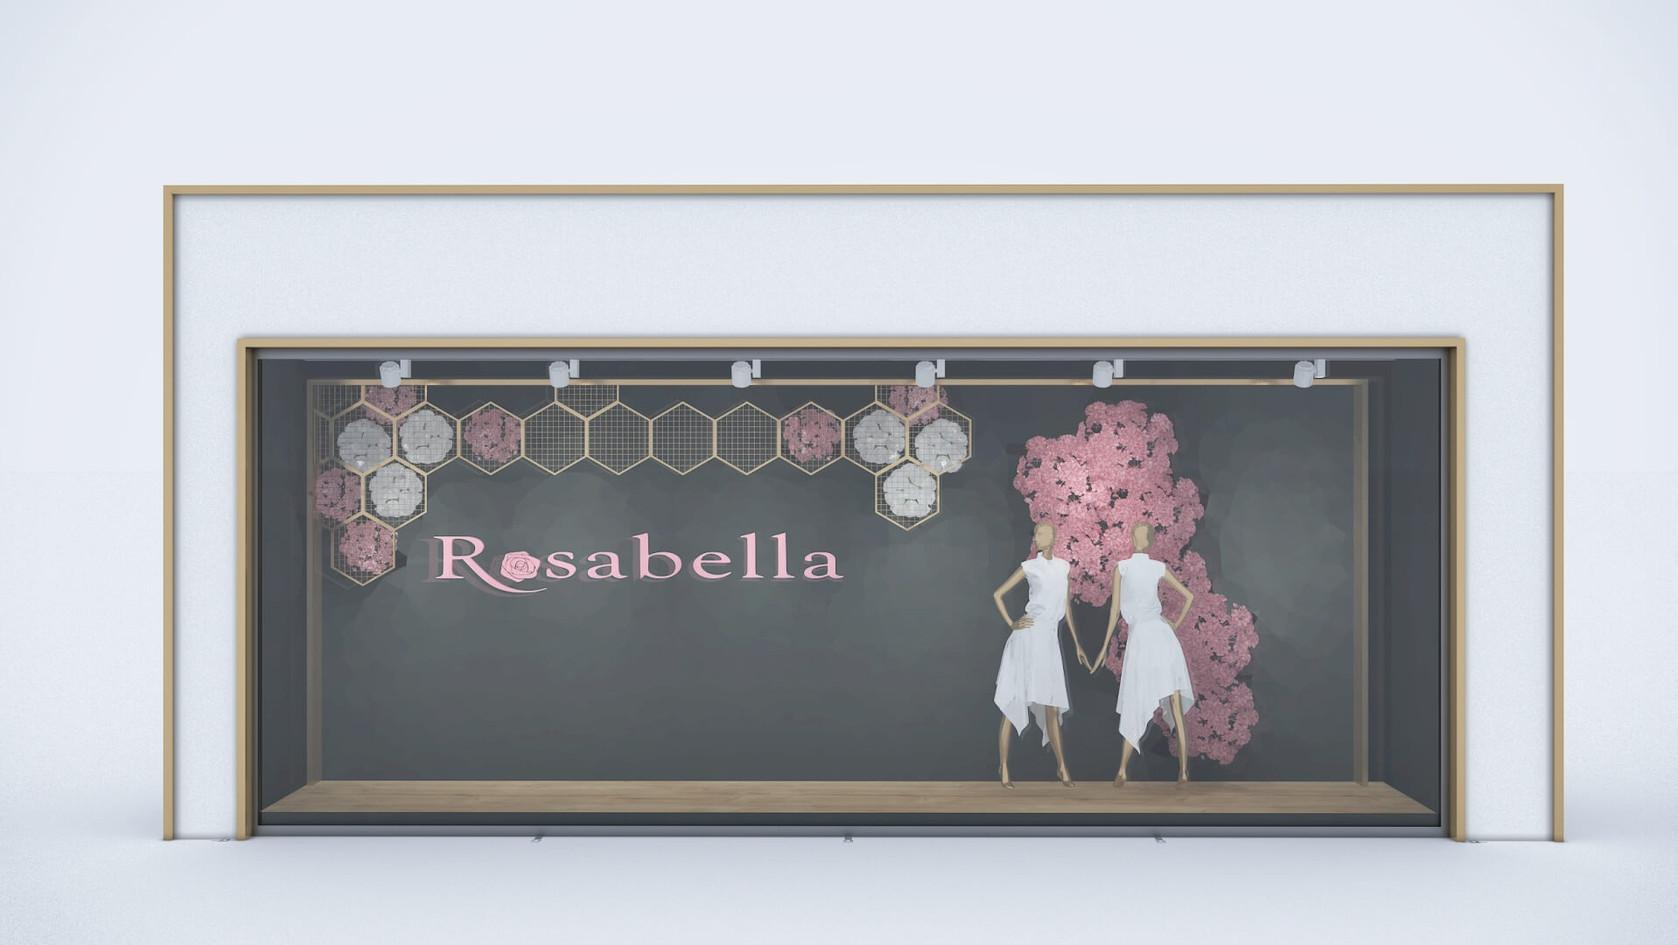 Rosabella - Fashion Store Shop Design